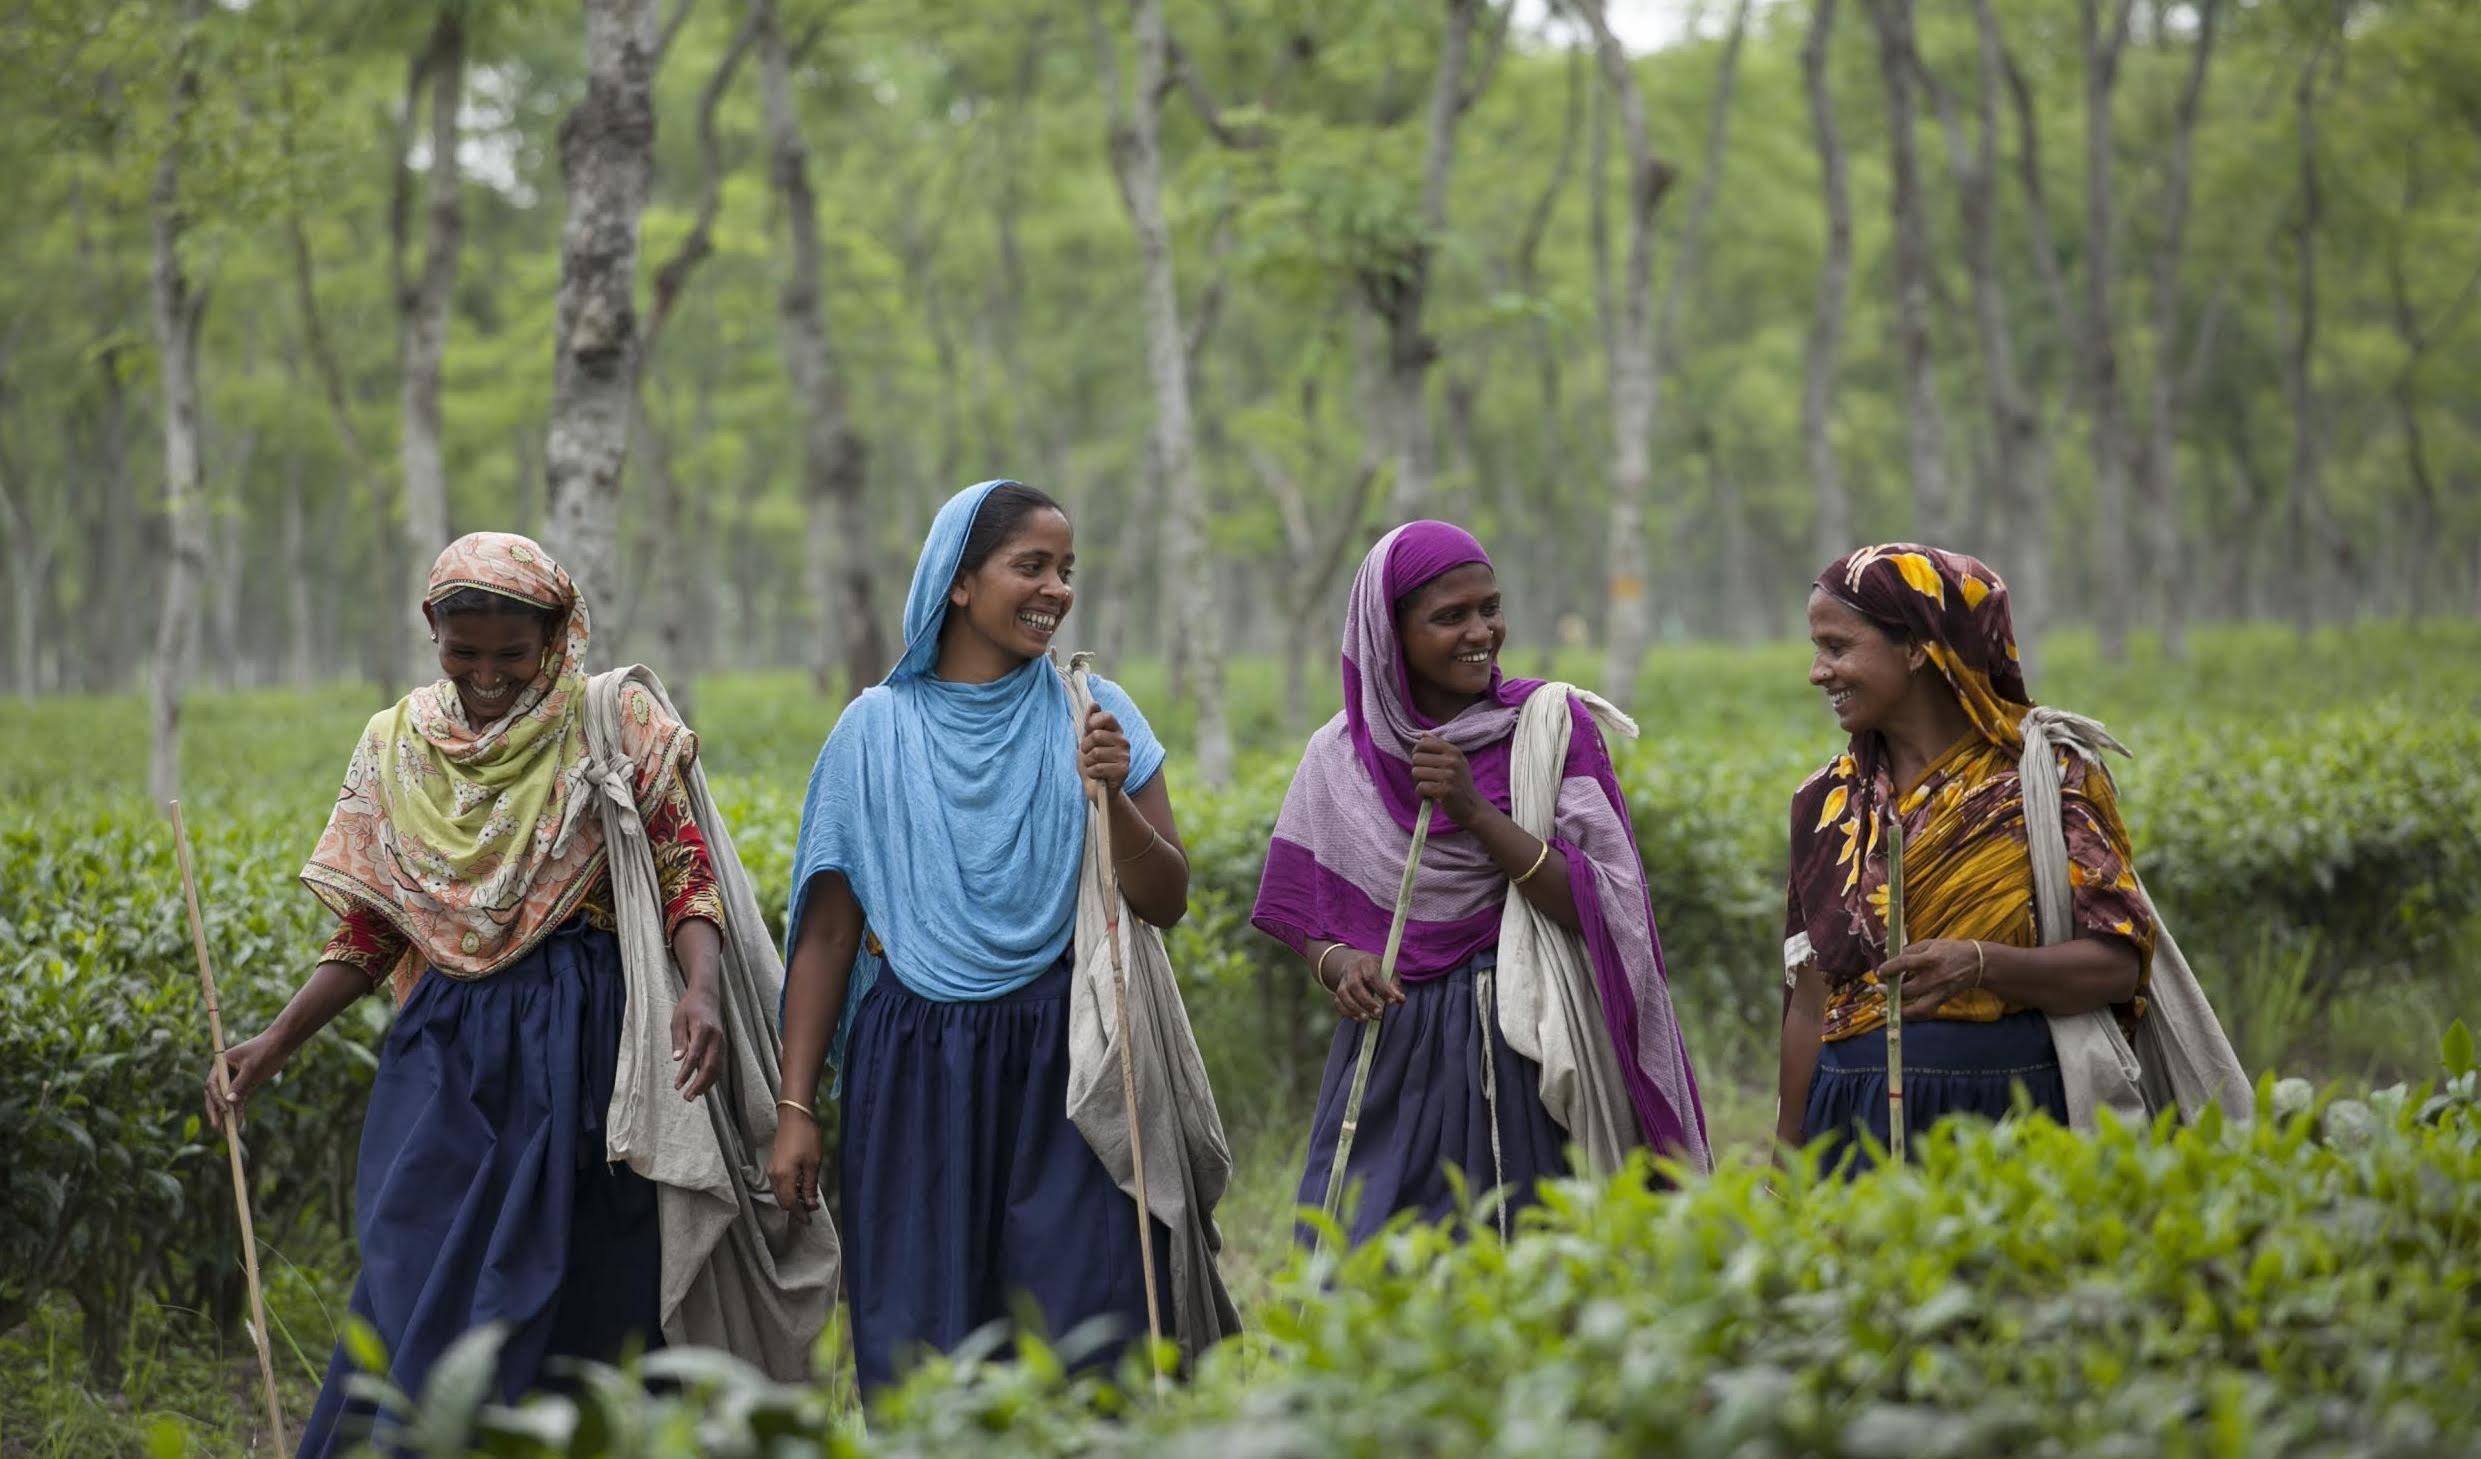 Womena at the Teatulia tea farm in Bangladesh